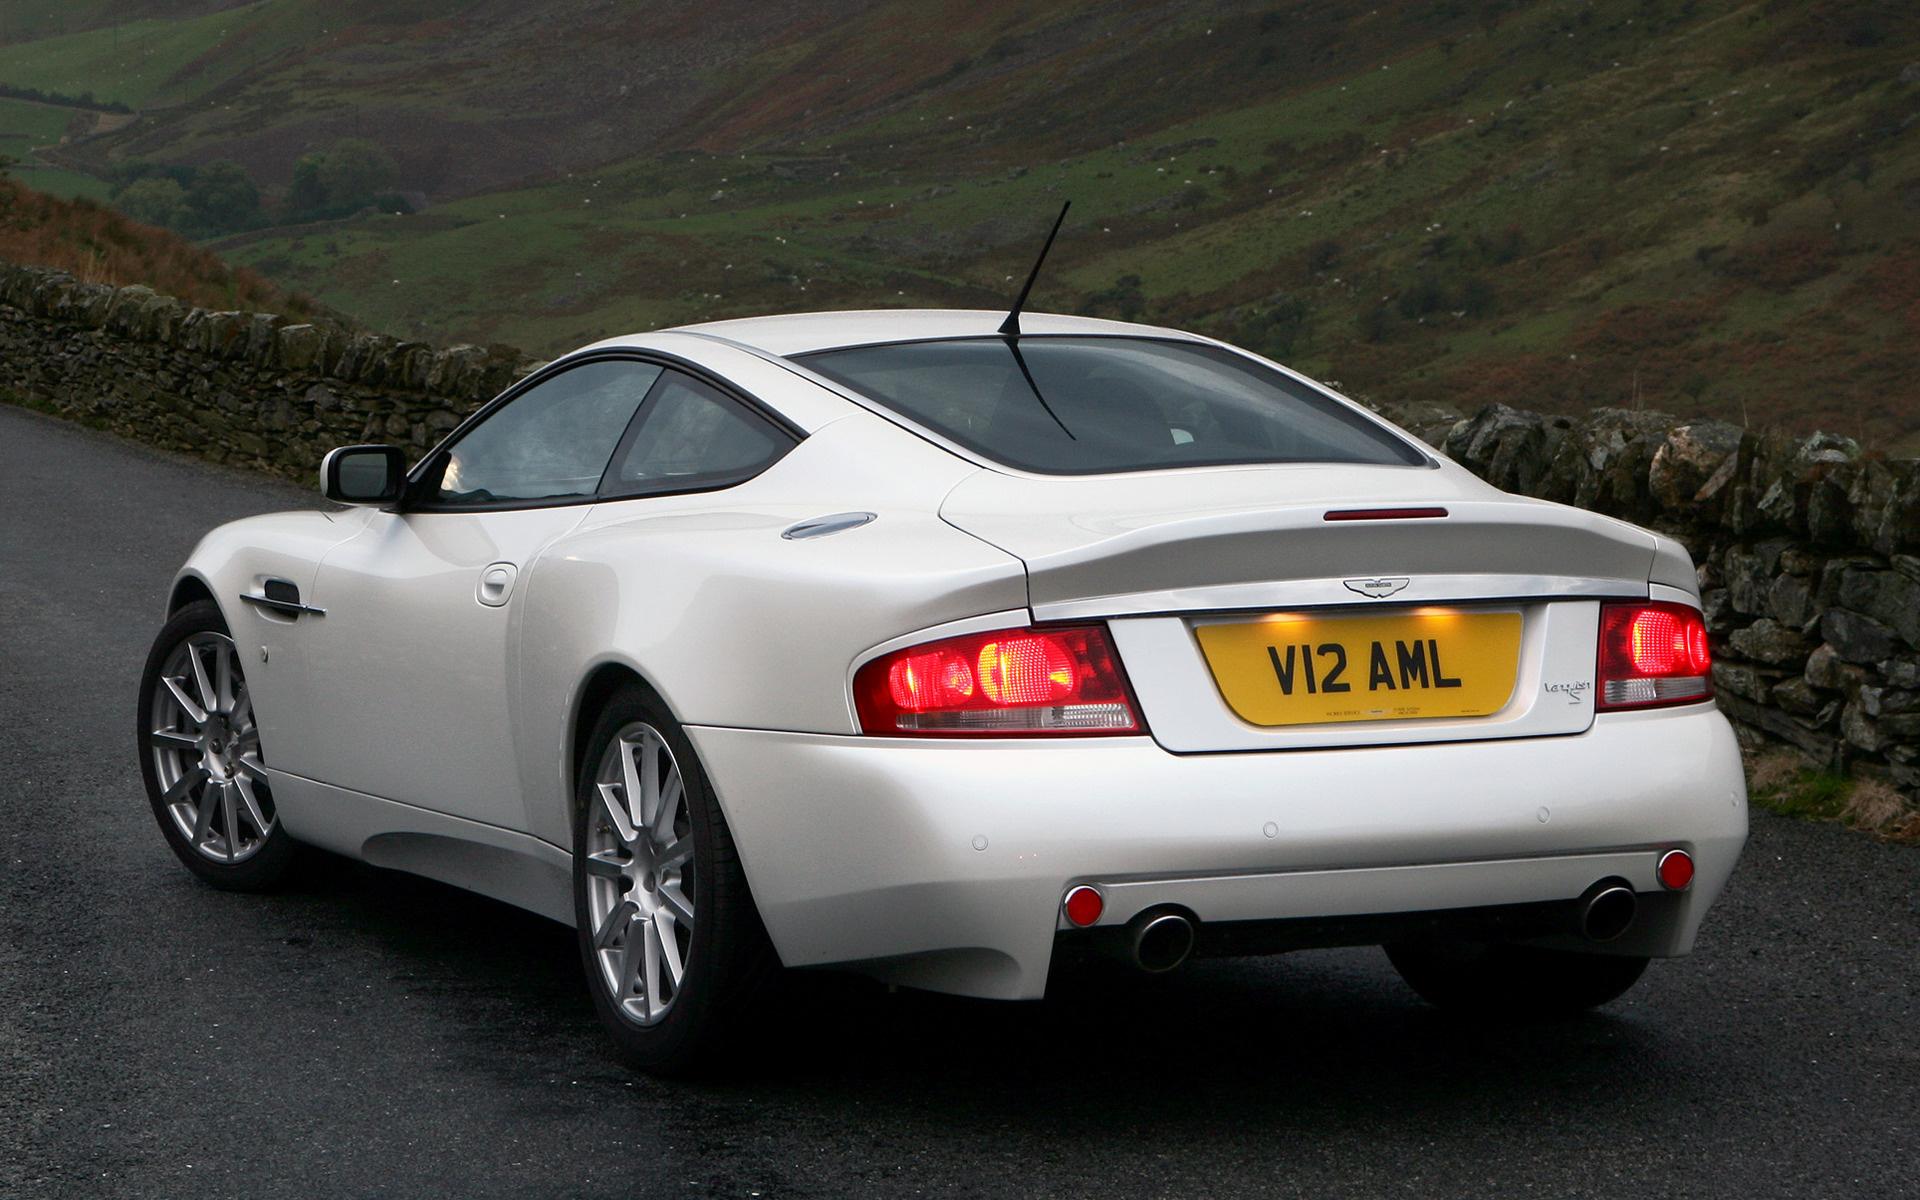 2004 Aston Martin Vanquish S Uk Wallpapers And Hd Images Car Pixel